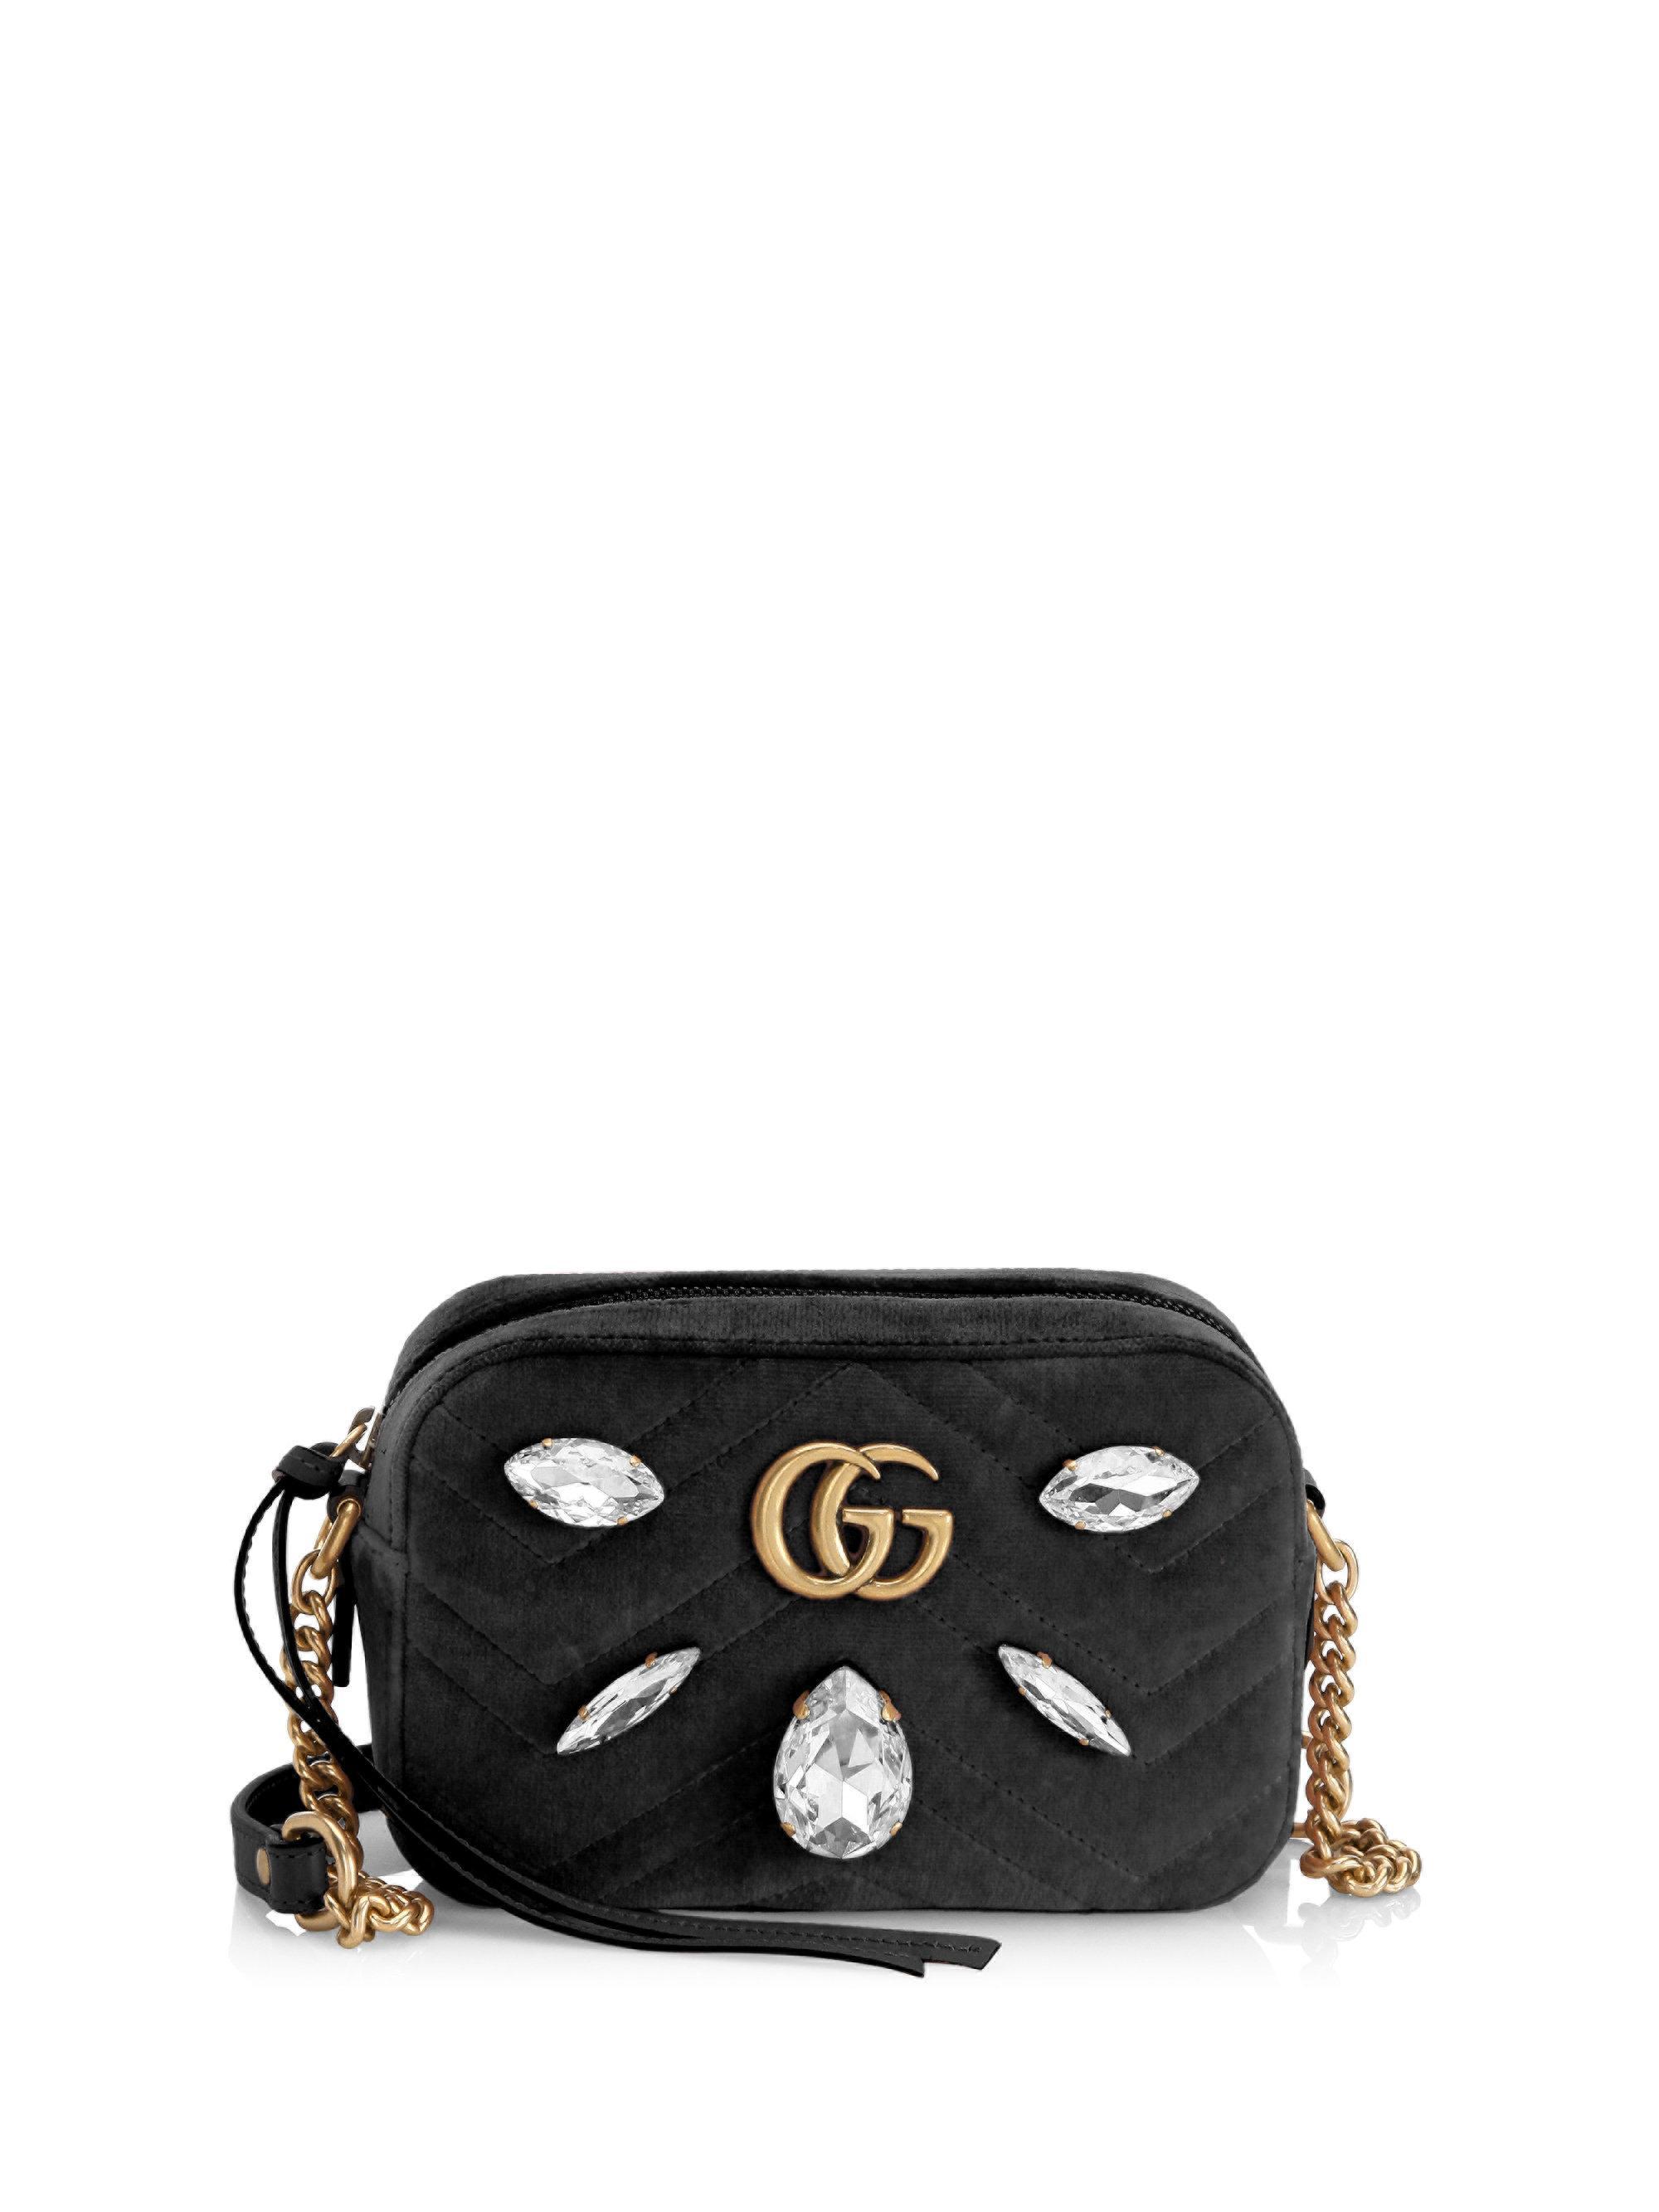 9c7b3b3fb41e8f Gucci Gg Marmont Velvet Mini Bag in Black - Lyst